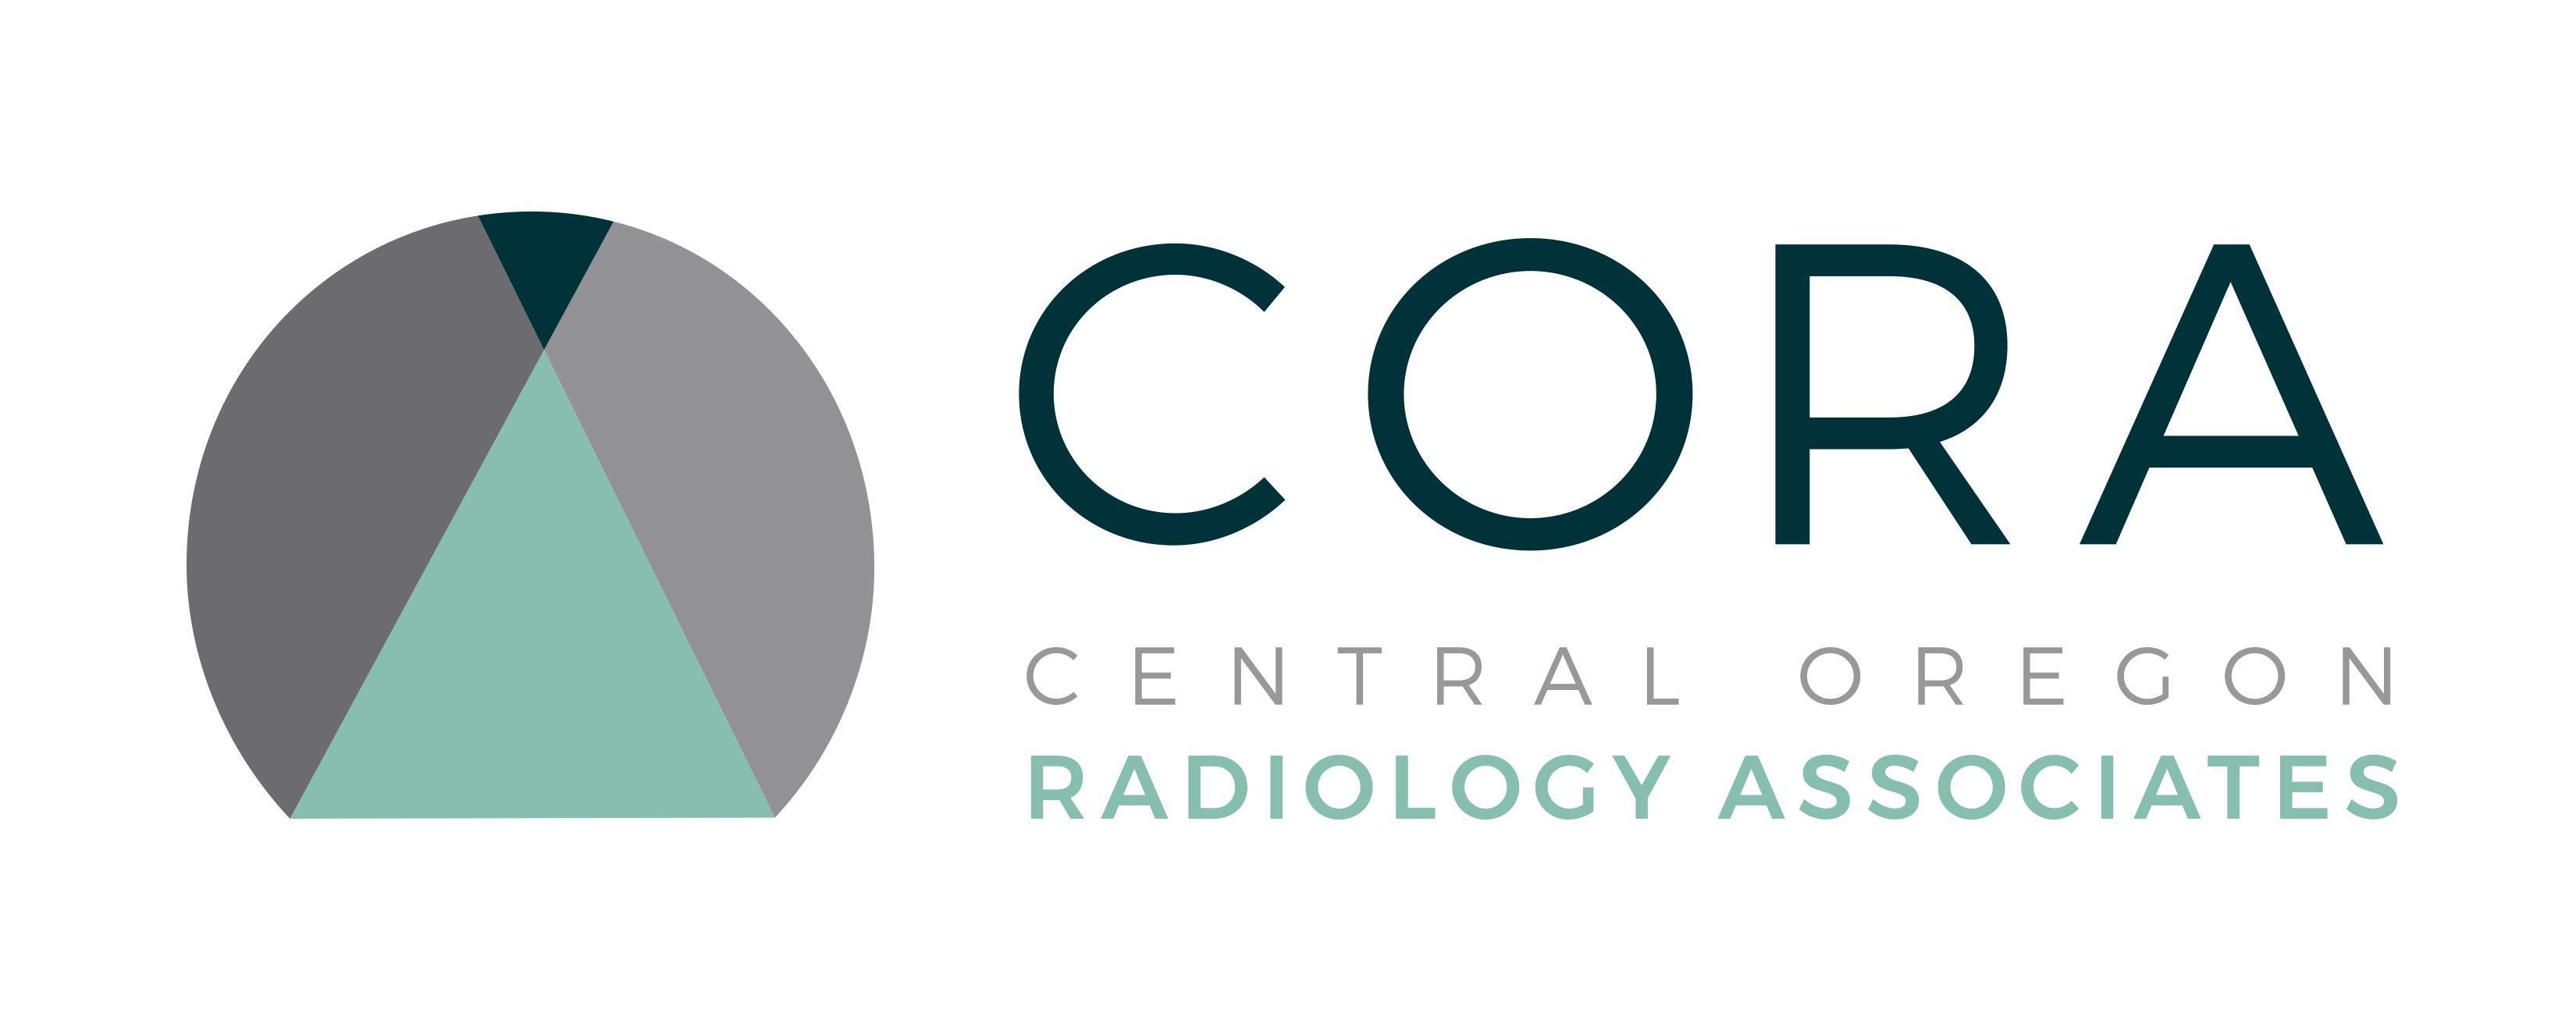 Central Oregon Radiology Associates company logo